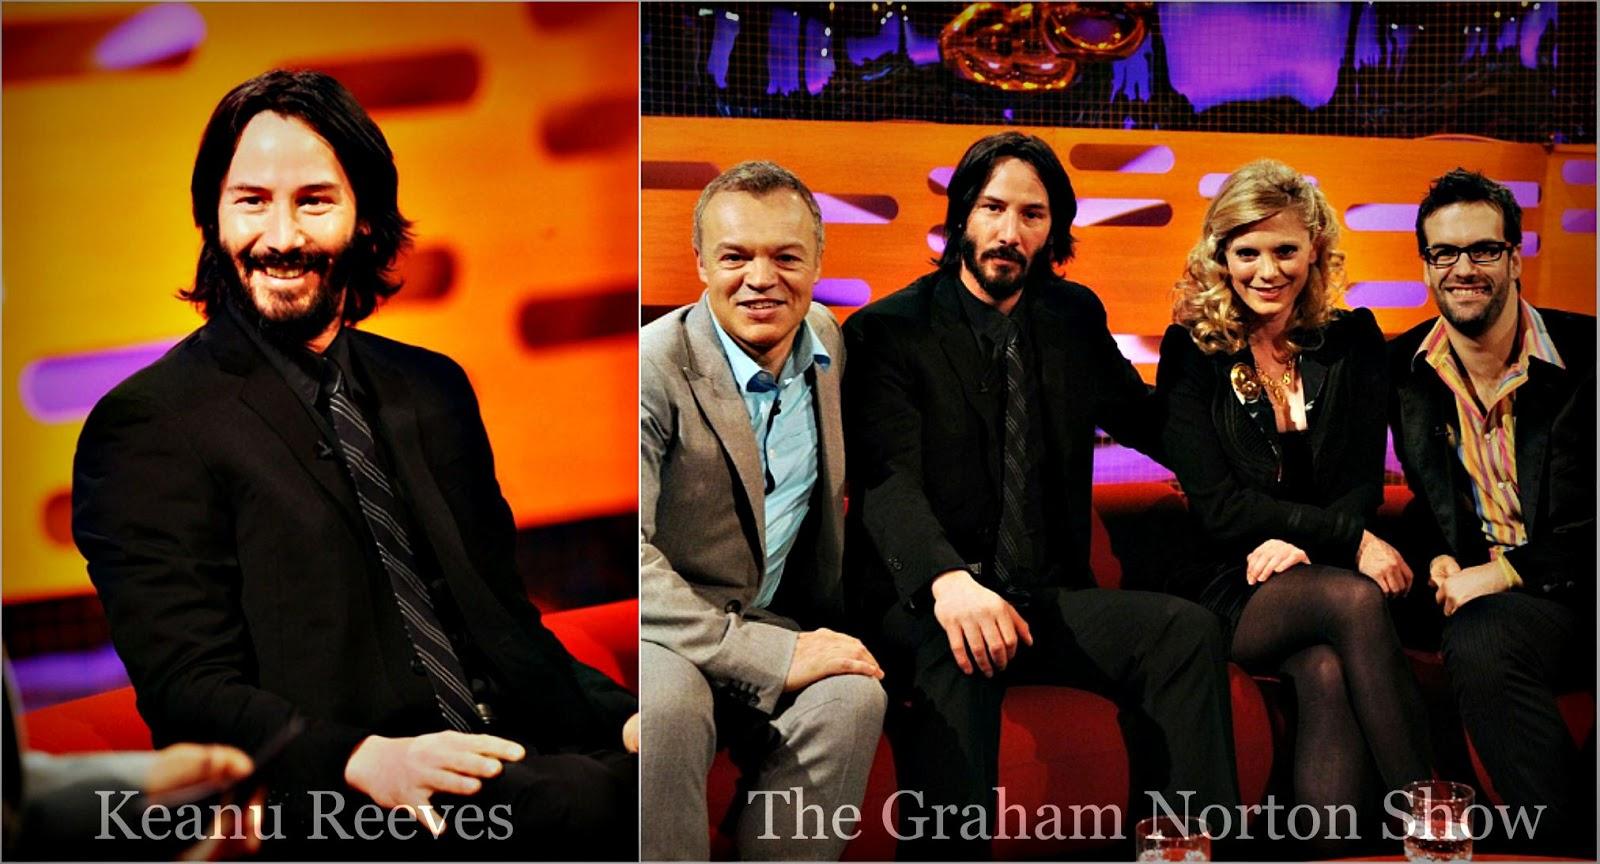 http://3.bp.blogspot.com/-ureIep7g-jw/TquniFsdqvI/AAAAAAAAAQE/XmL9Twt6Hw8/s1600/Collage+The+Graham+Norton+Show+Keanu+Reeves+%2528PCRE%2529.jpg